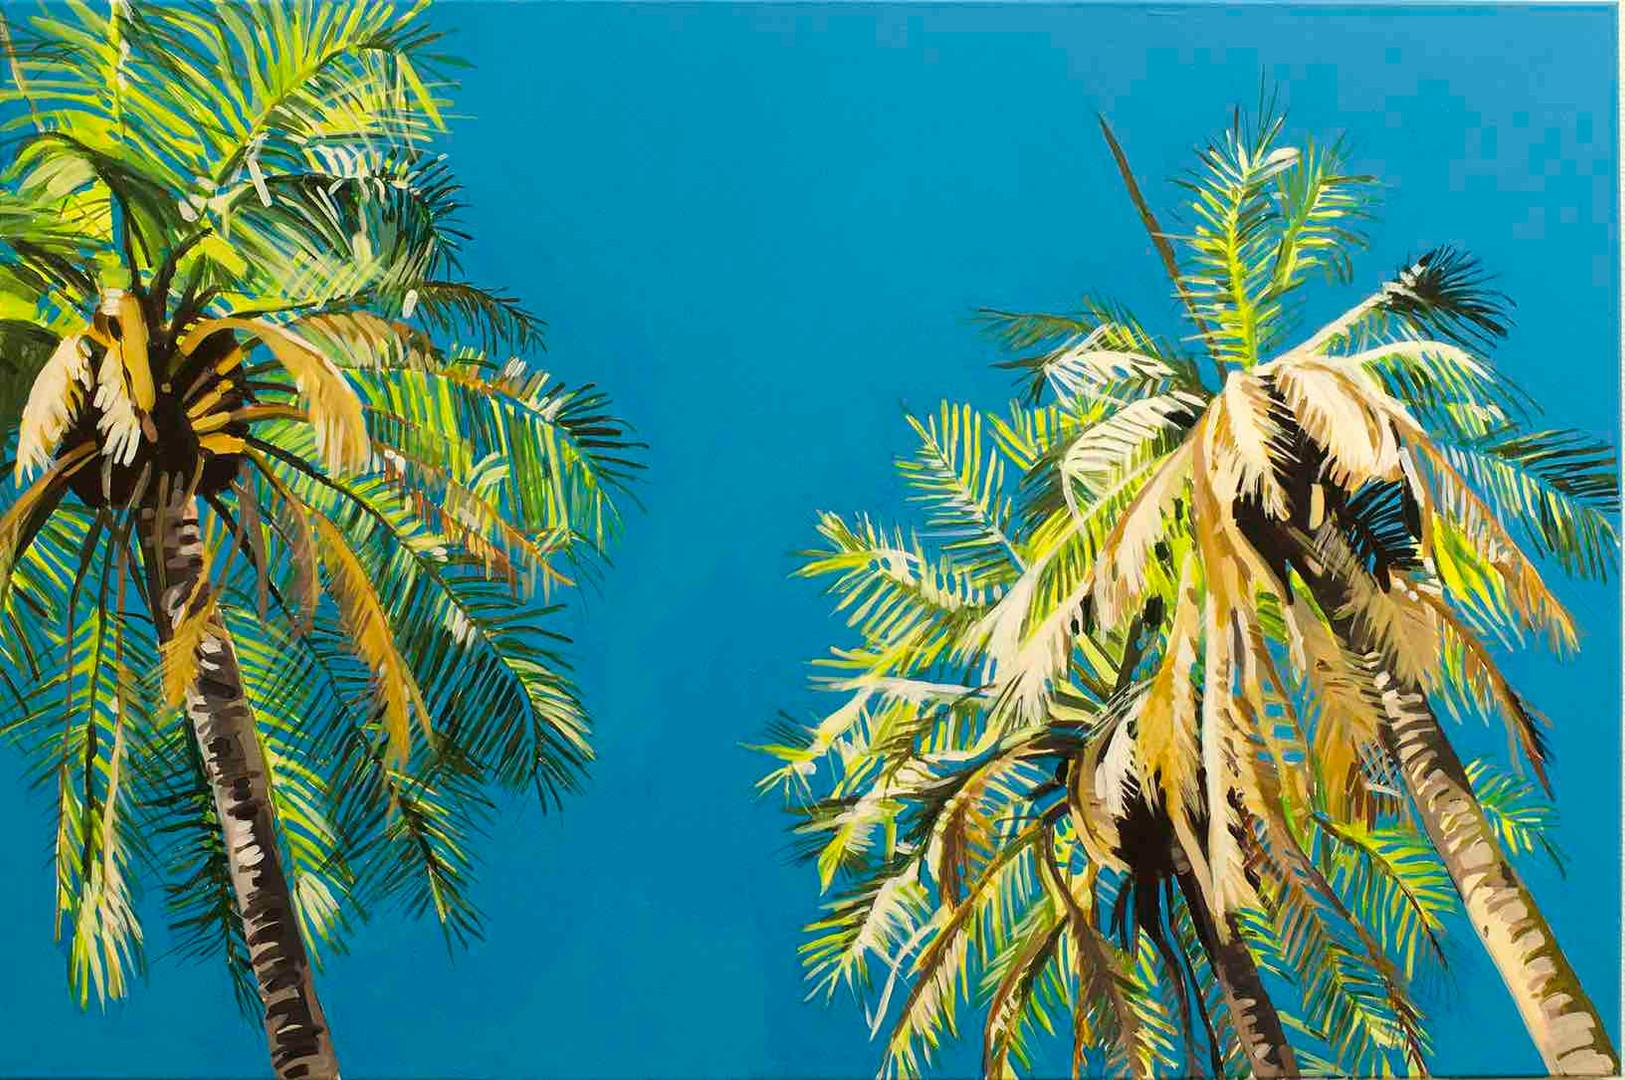 Paradise Lost T. Skjelland